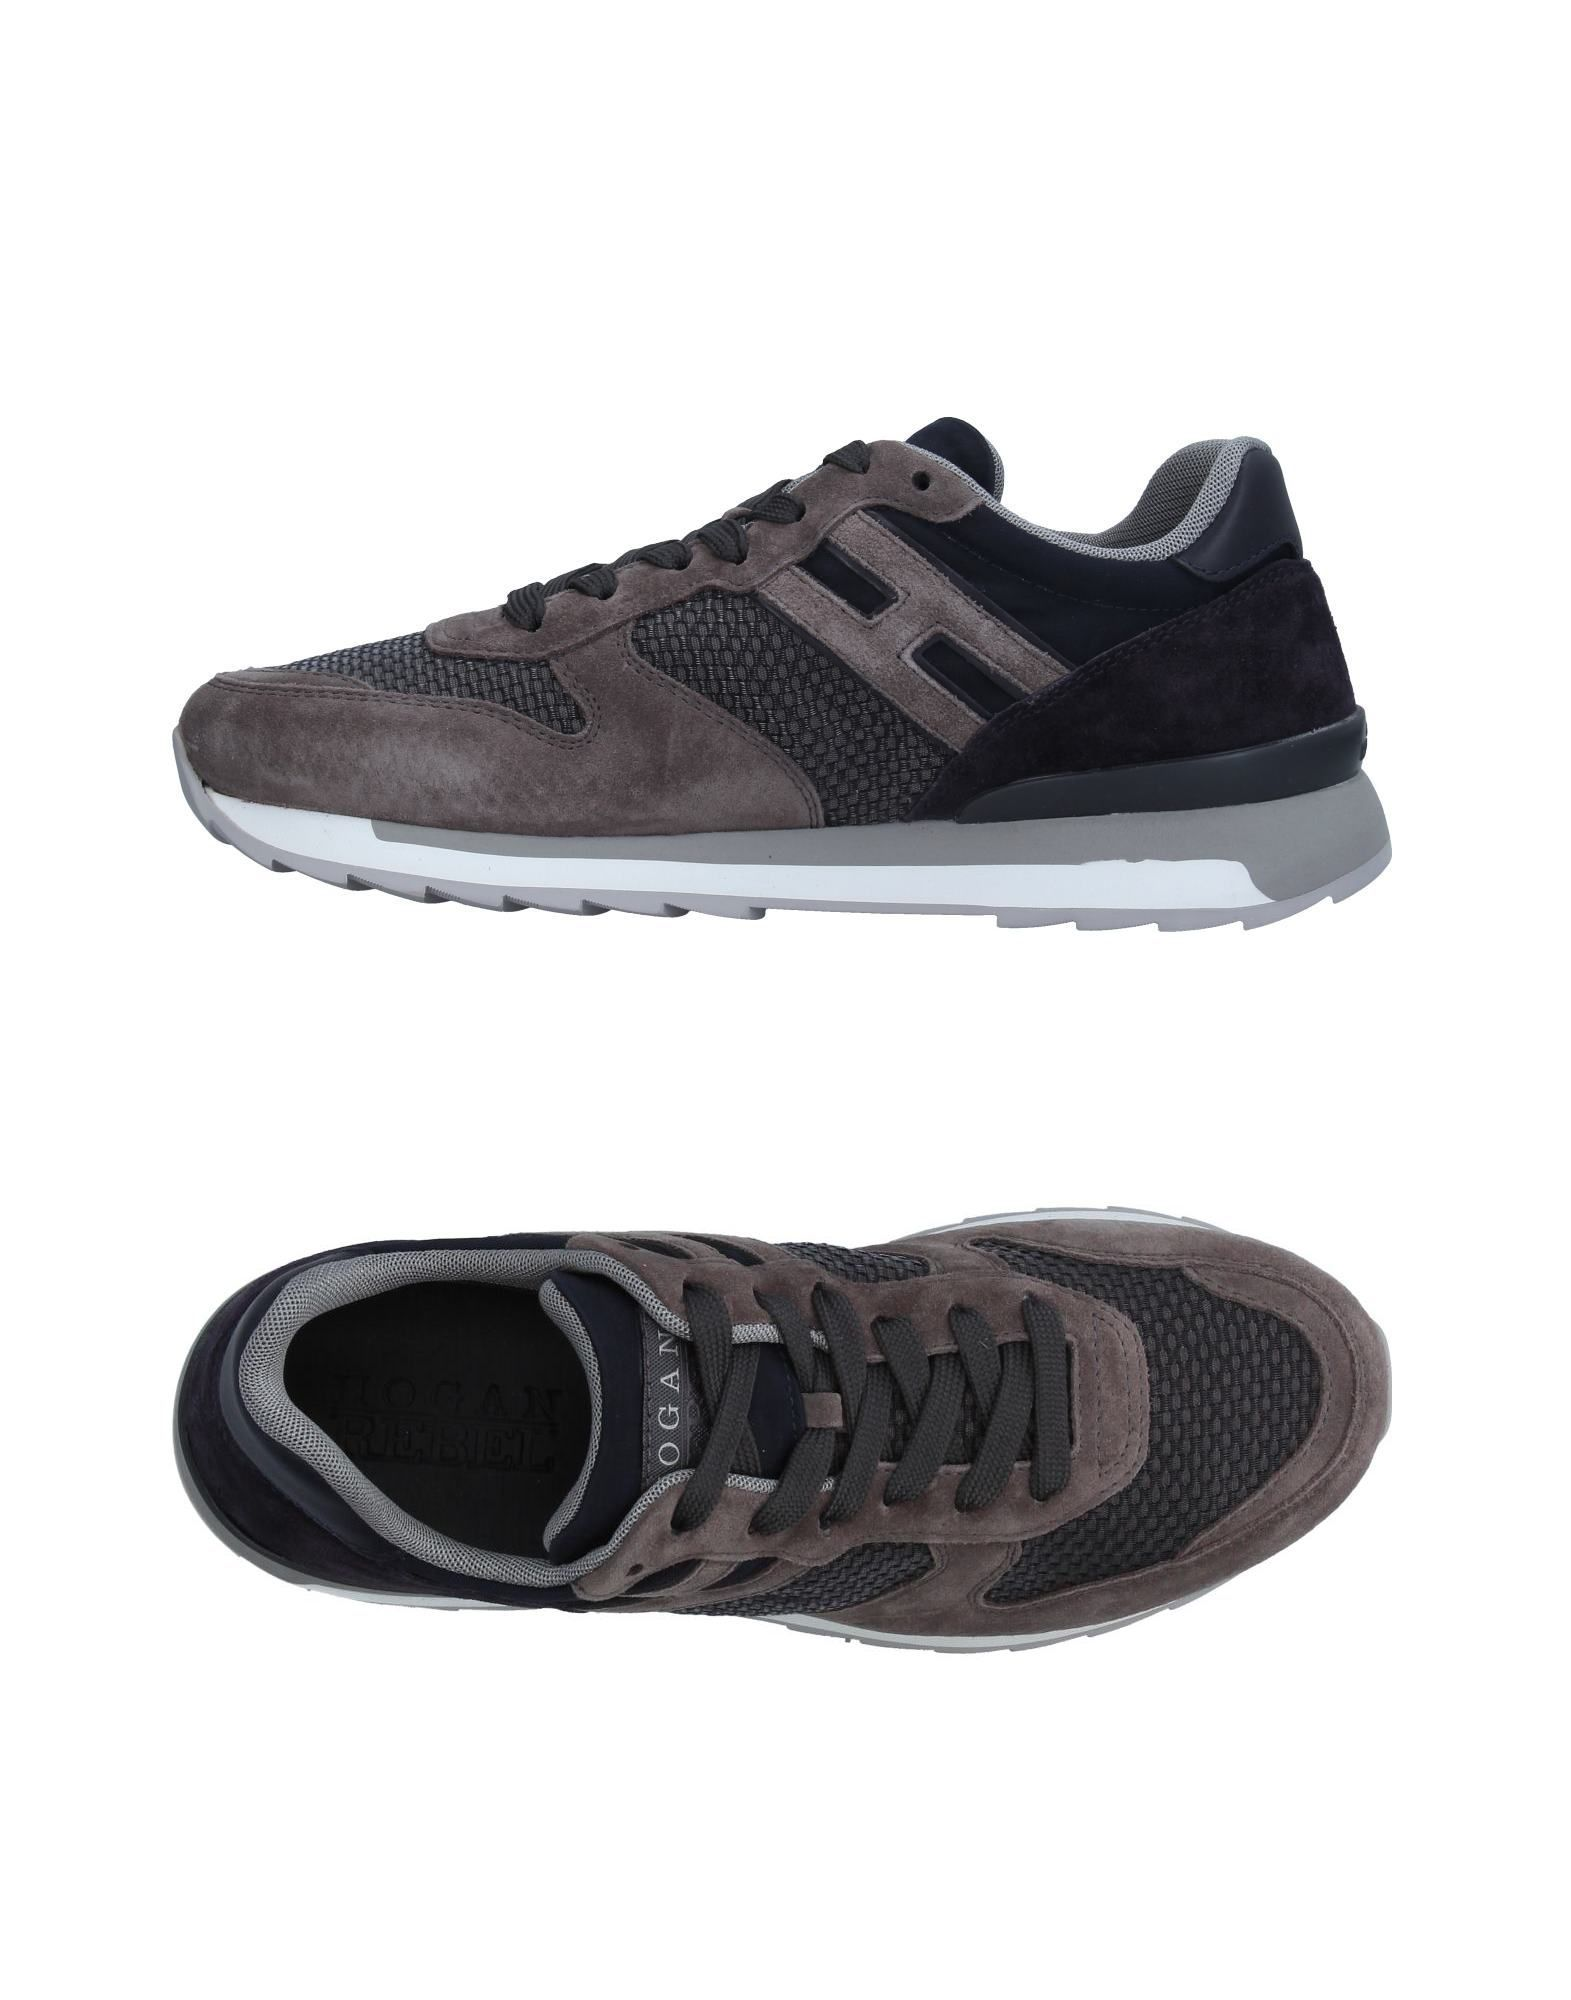 Hogan Rebel Sneakers Herren  11297019CJ Gute Qualität beliebte Schuhe